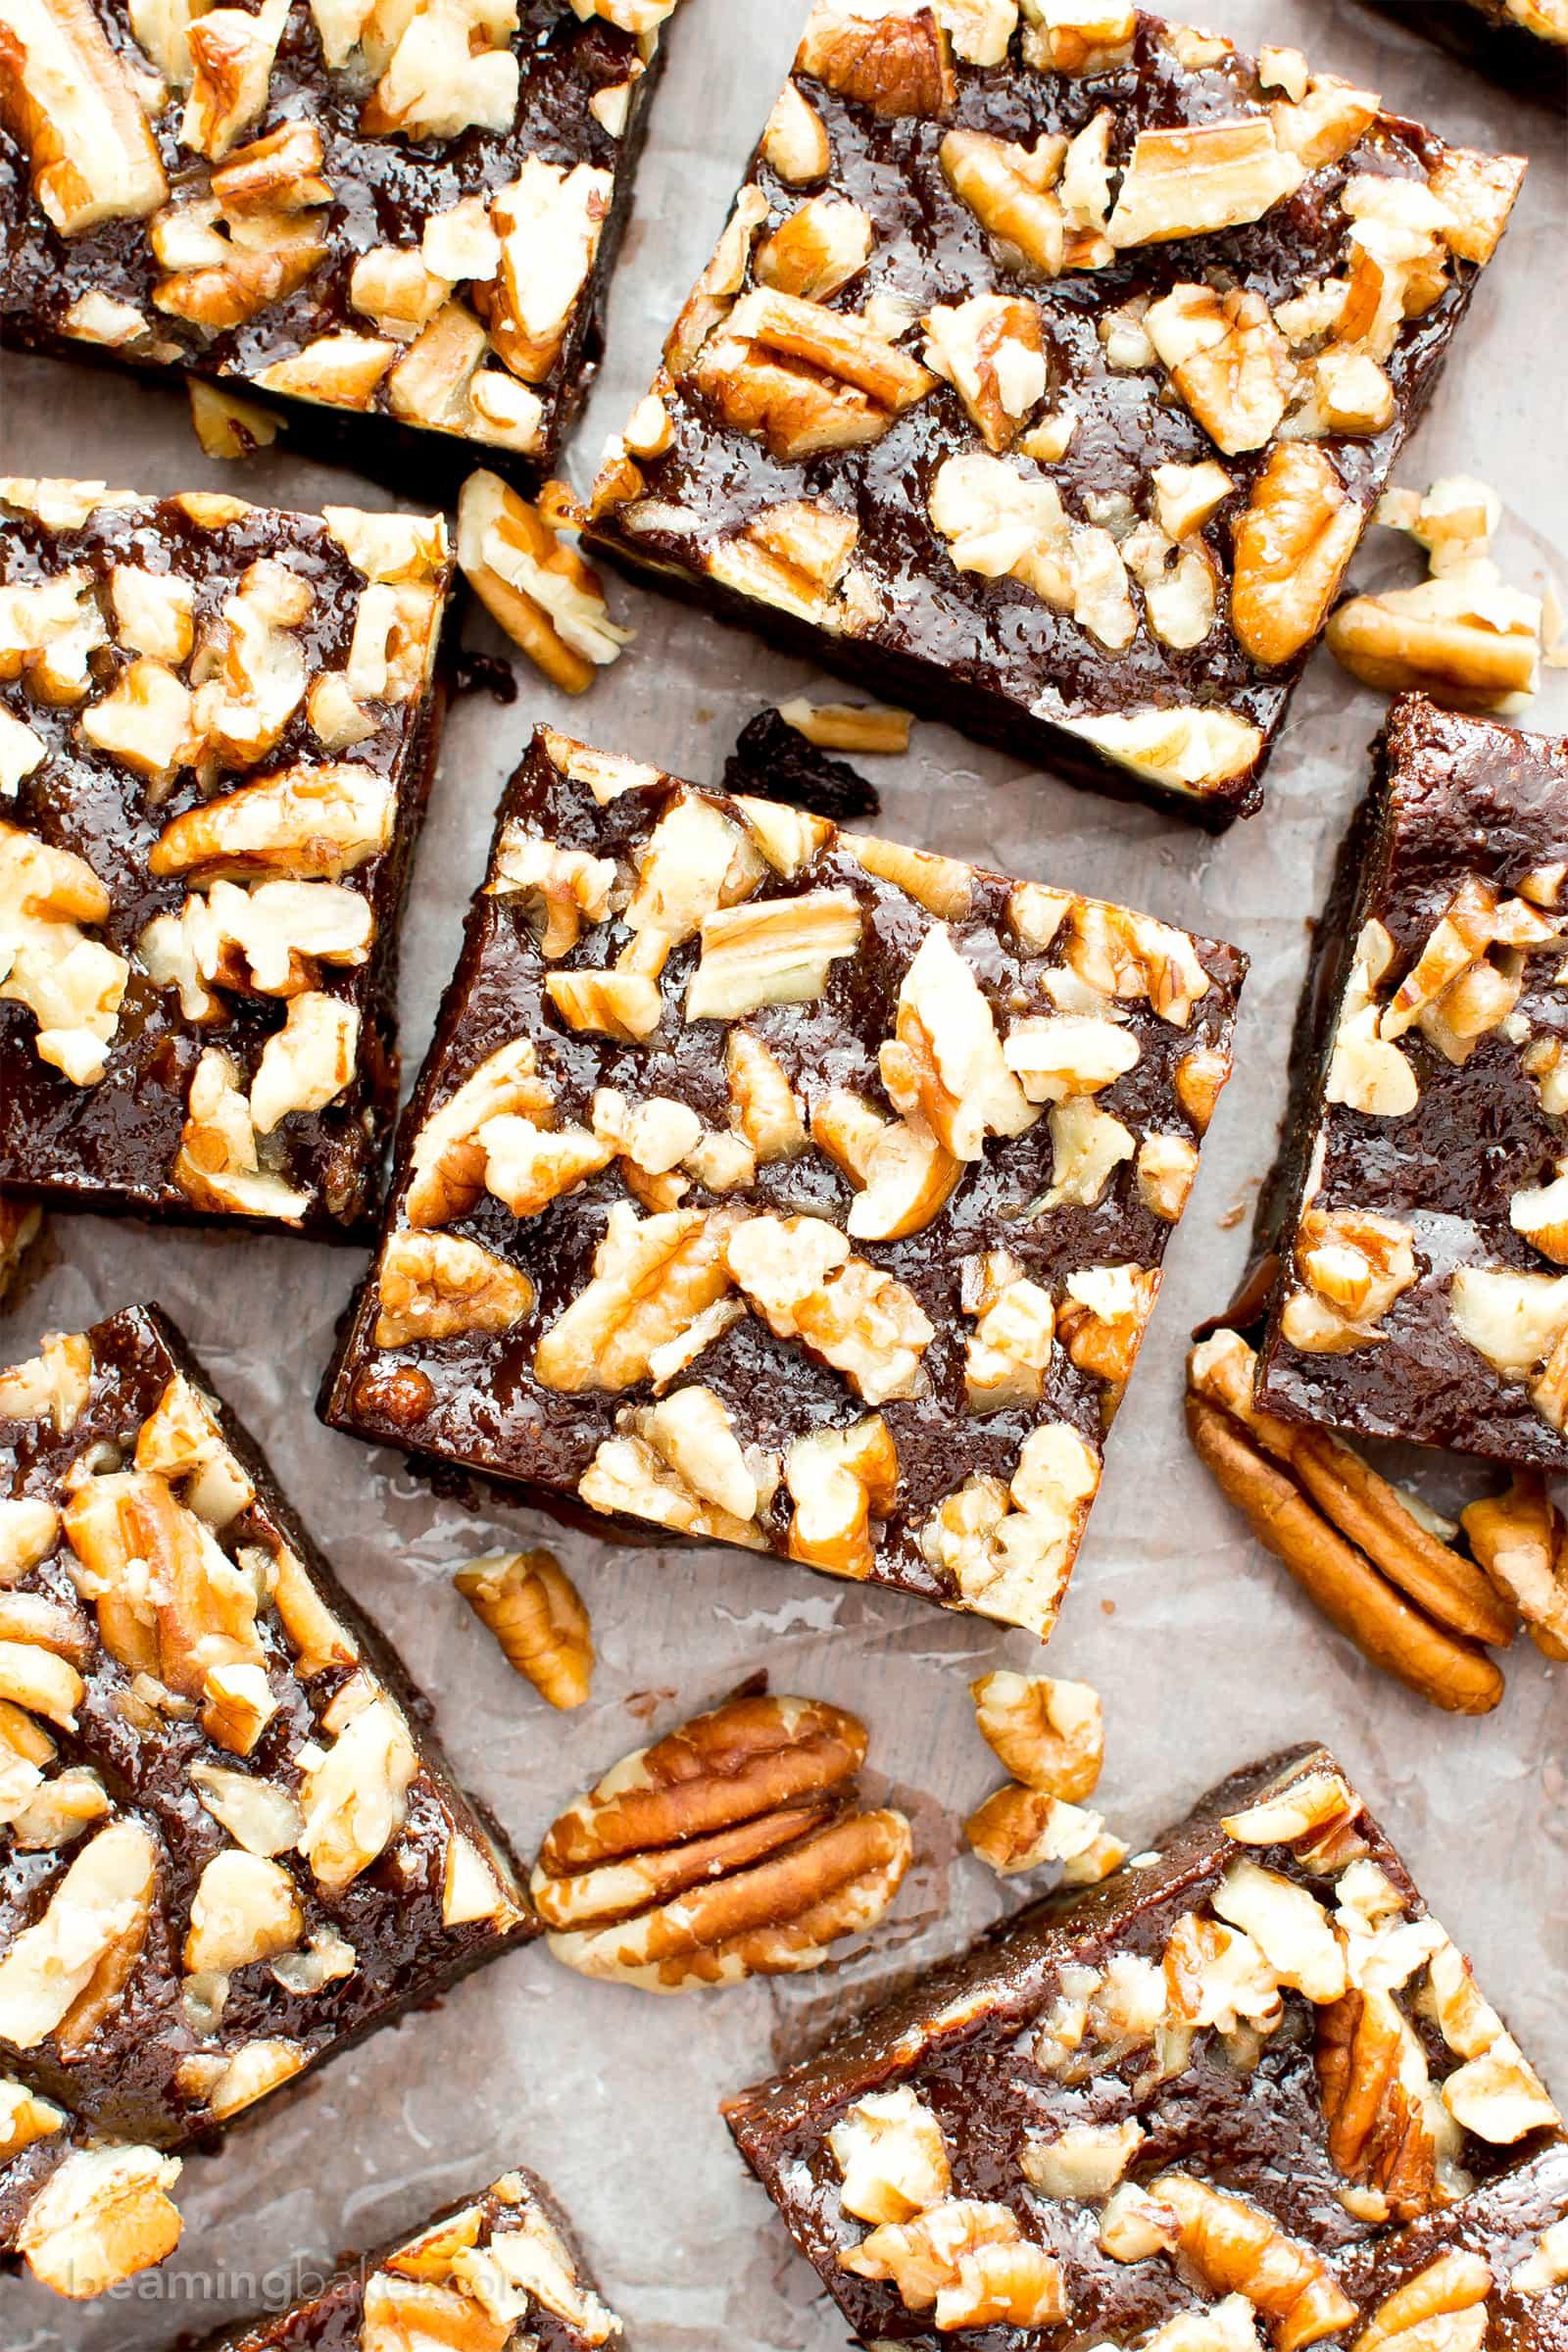 Super Fudgy Paleo Maple Pecan Brownies (V, GF): supremely fudgy chocolate brownies topped with delightfully sweet maple pecans. #Paleo #Vegan #GlutenFree #DairyFree #Chocolate #Dessert | Recipe on BeamingBaker.com